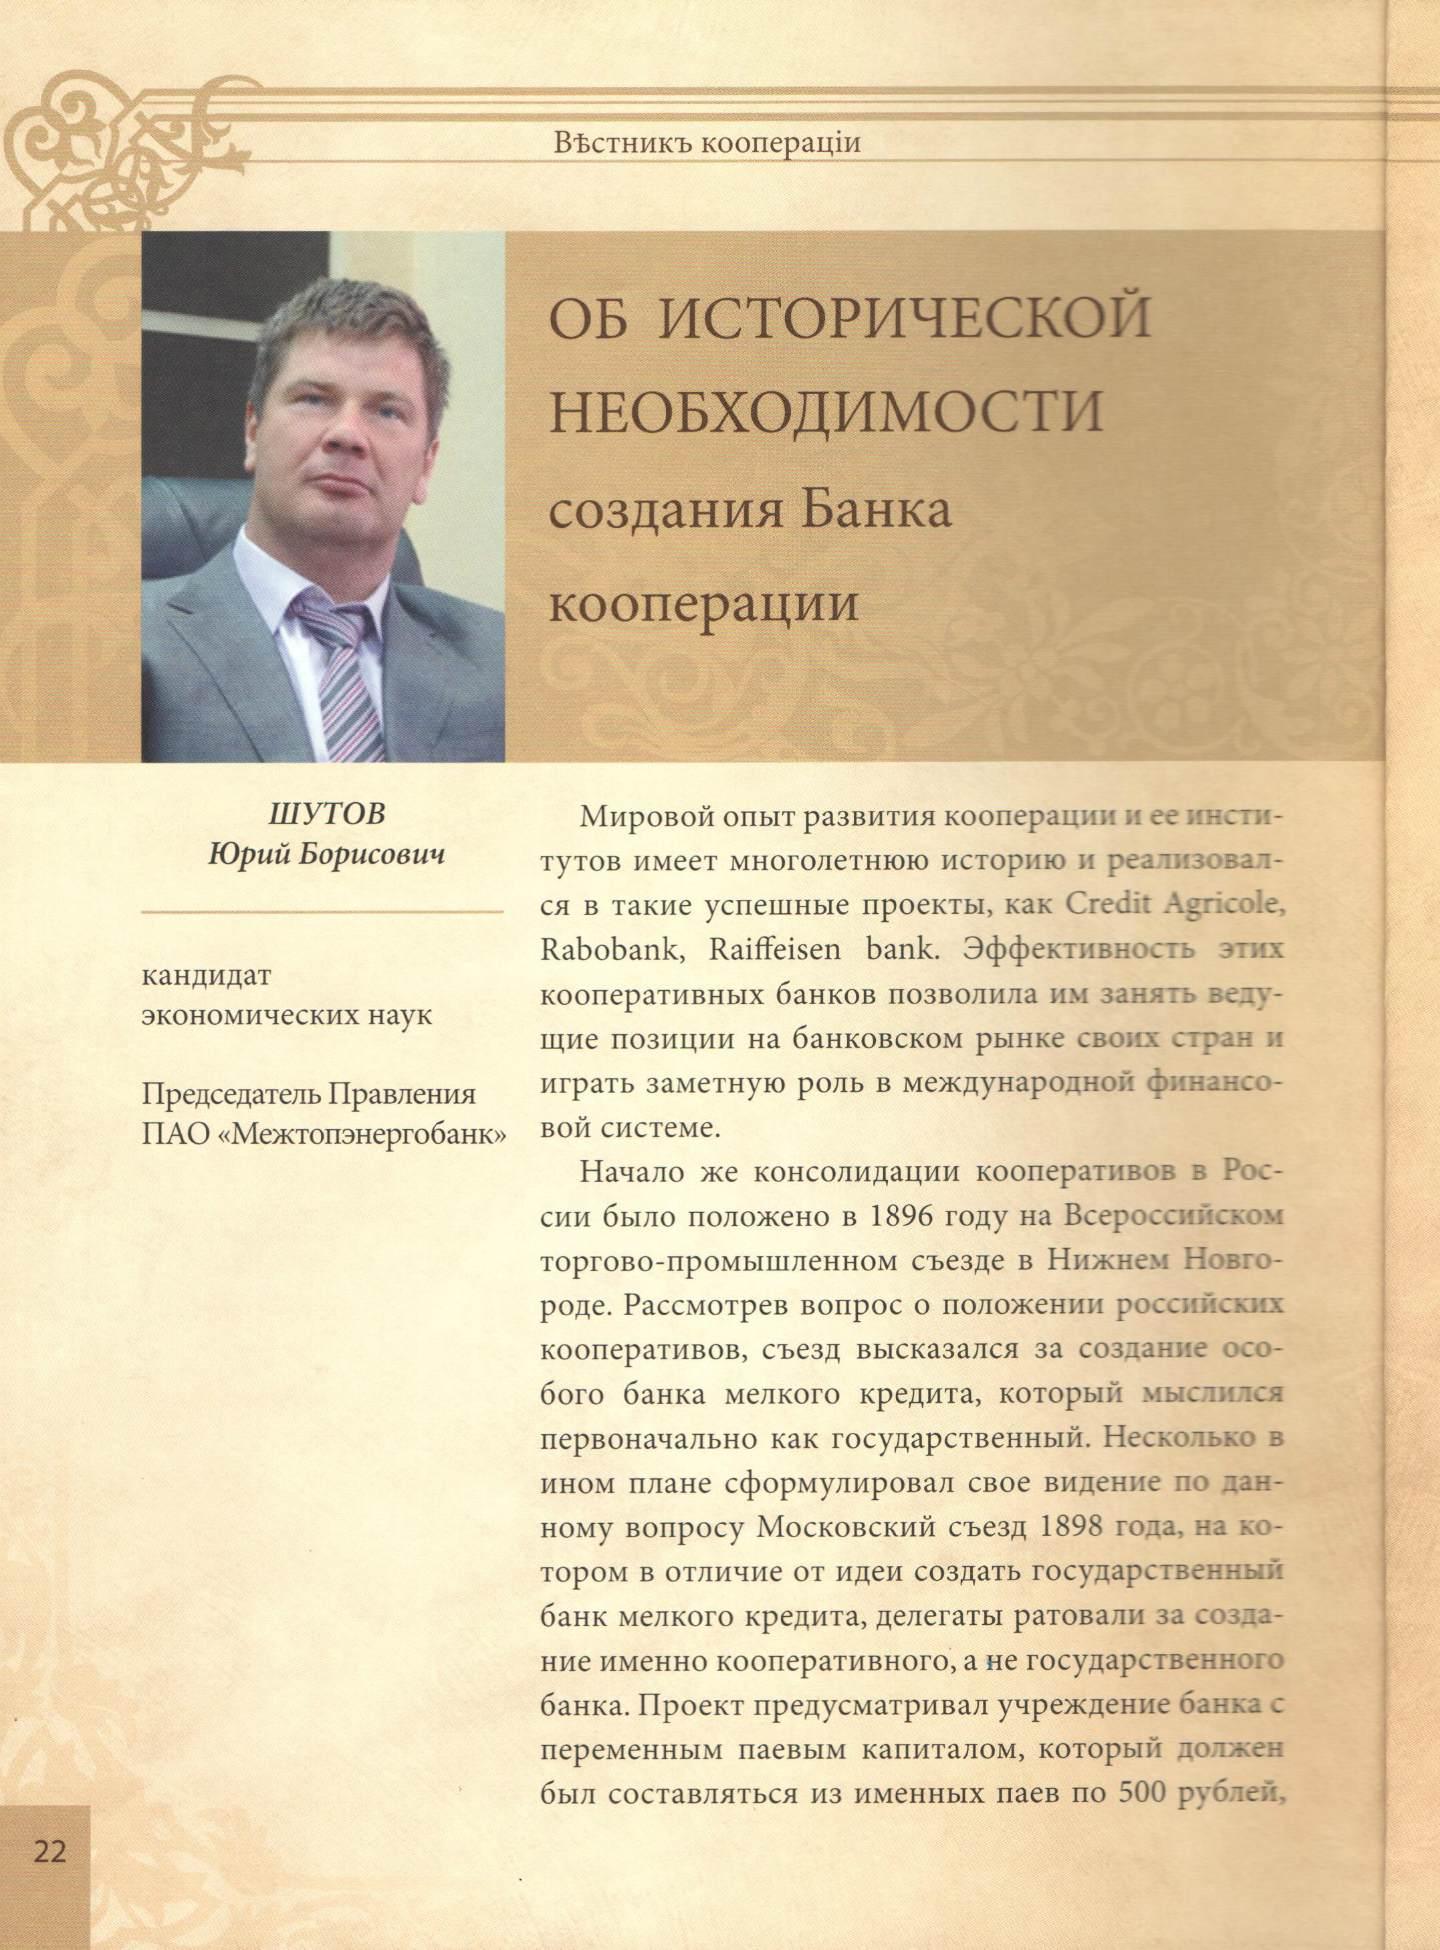 Вестник кооперации-22